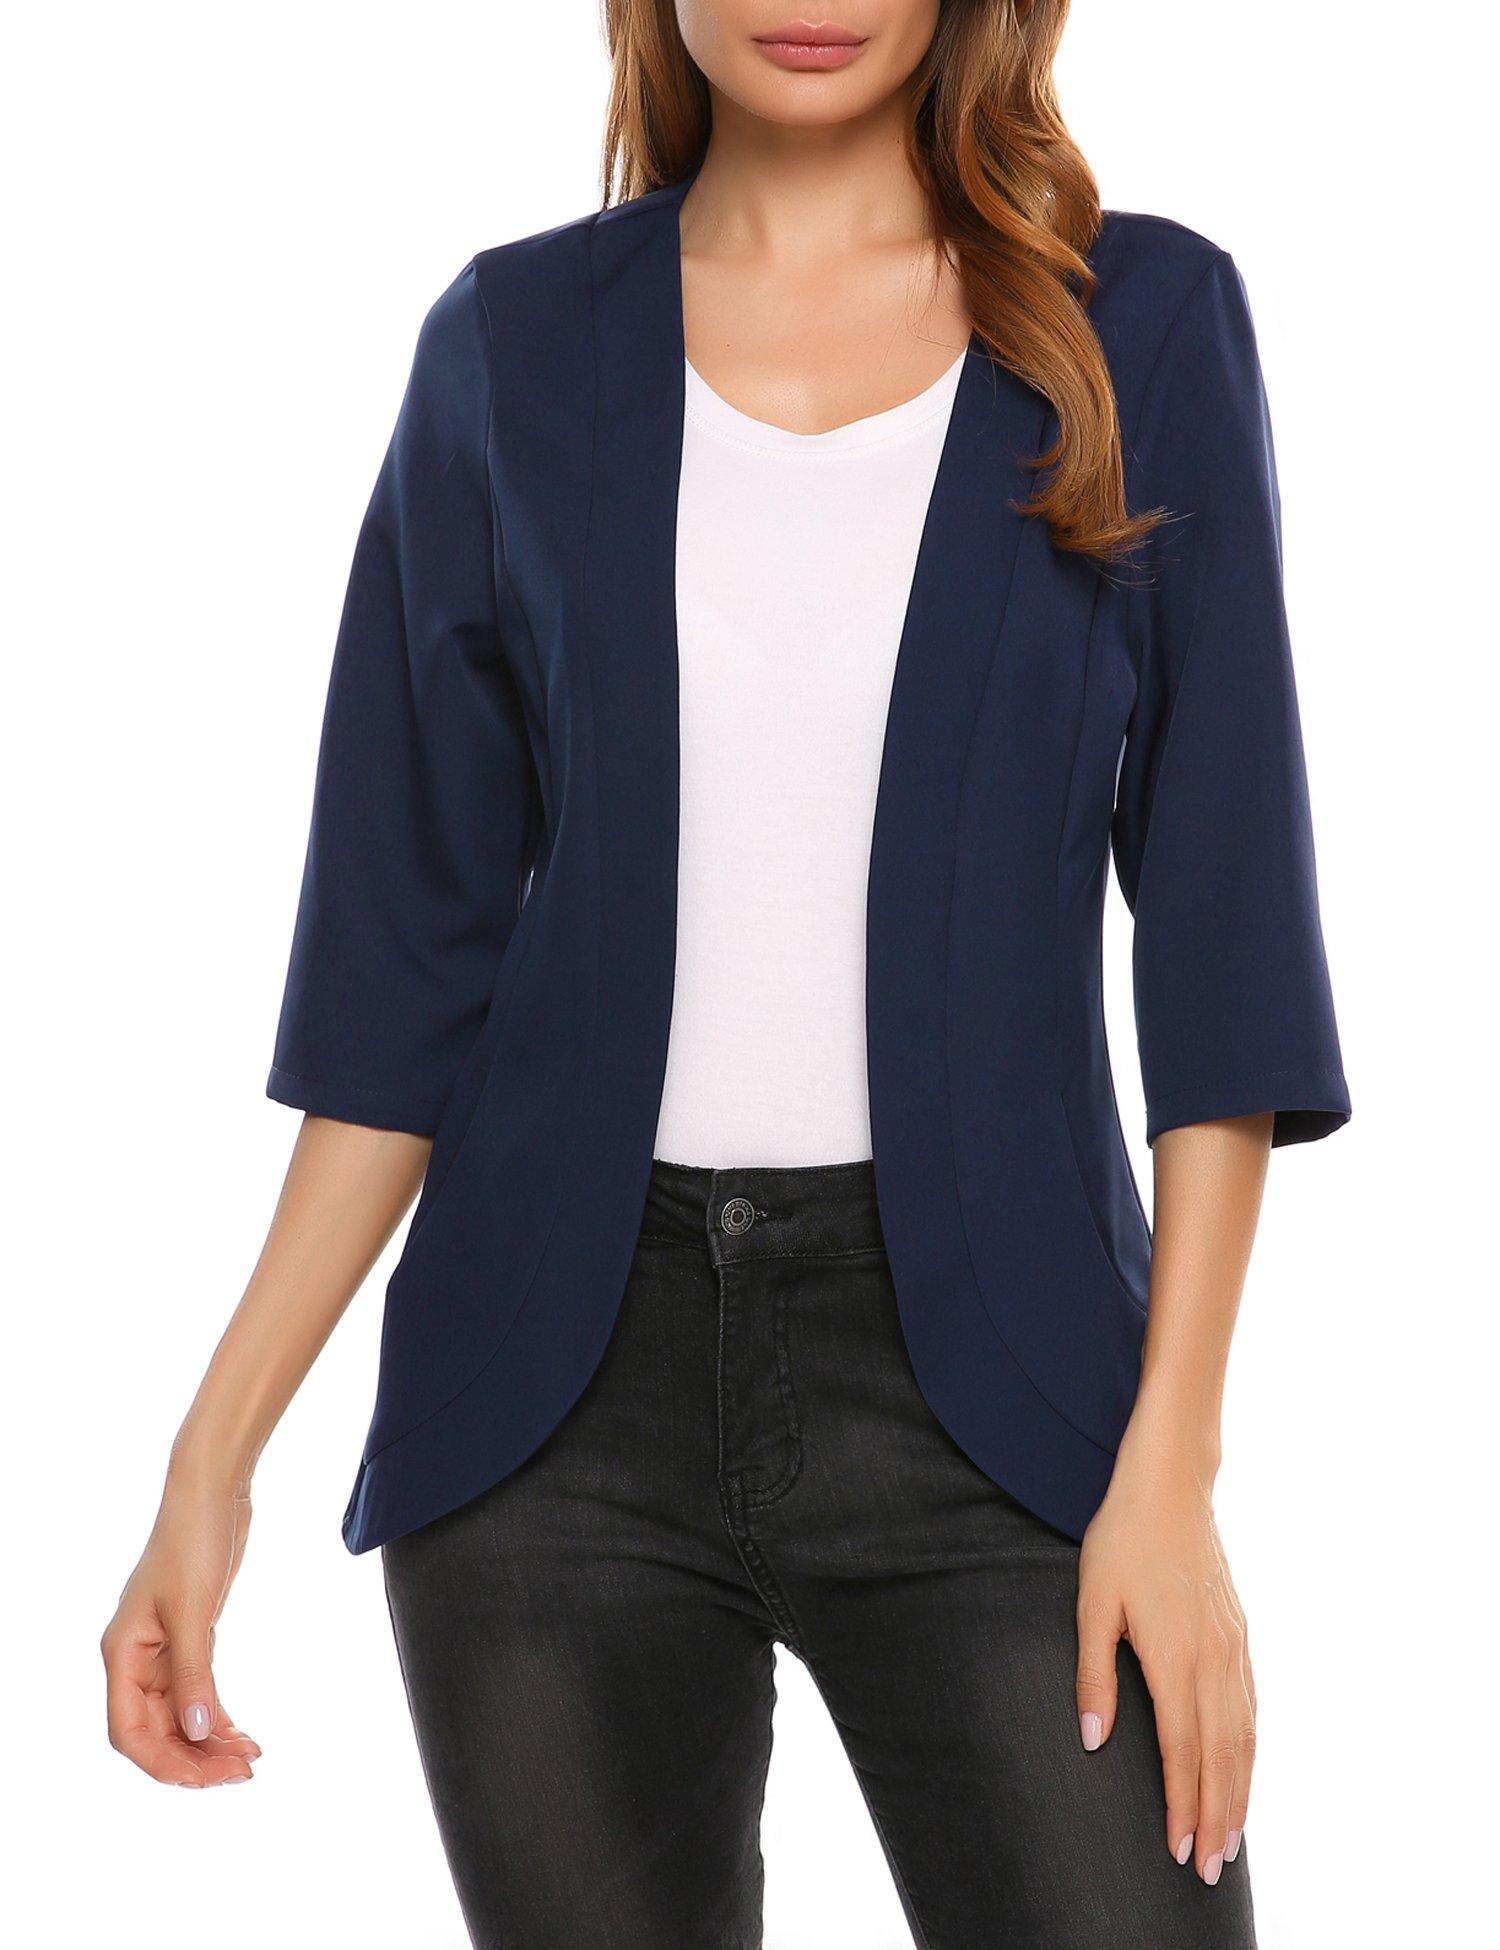 Beyove Women's 3/4 Sleeve Open Front Cardigan Blazer Jacket